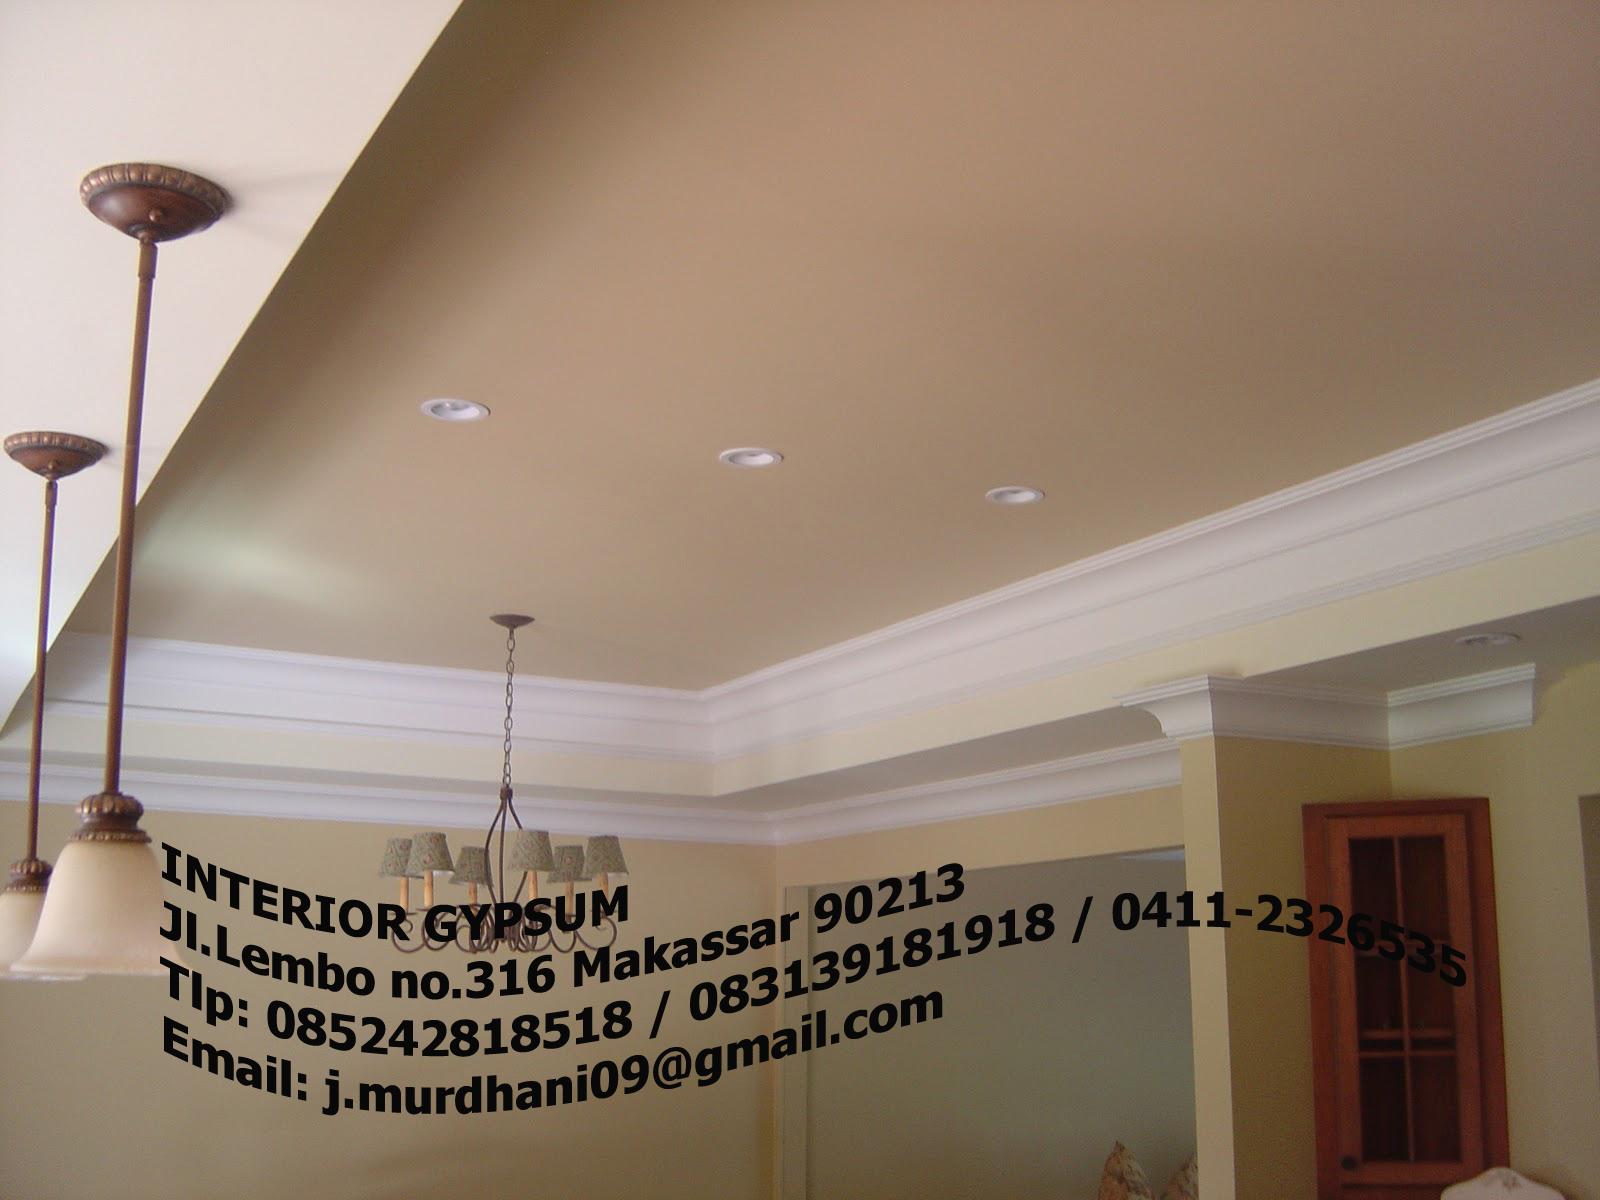 Contoh Gambar Lis Plafon Gypsum Expo Desain Rumah